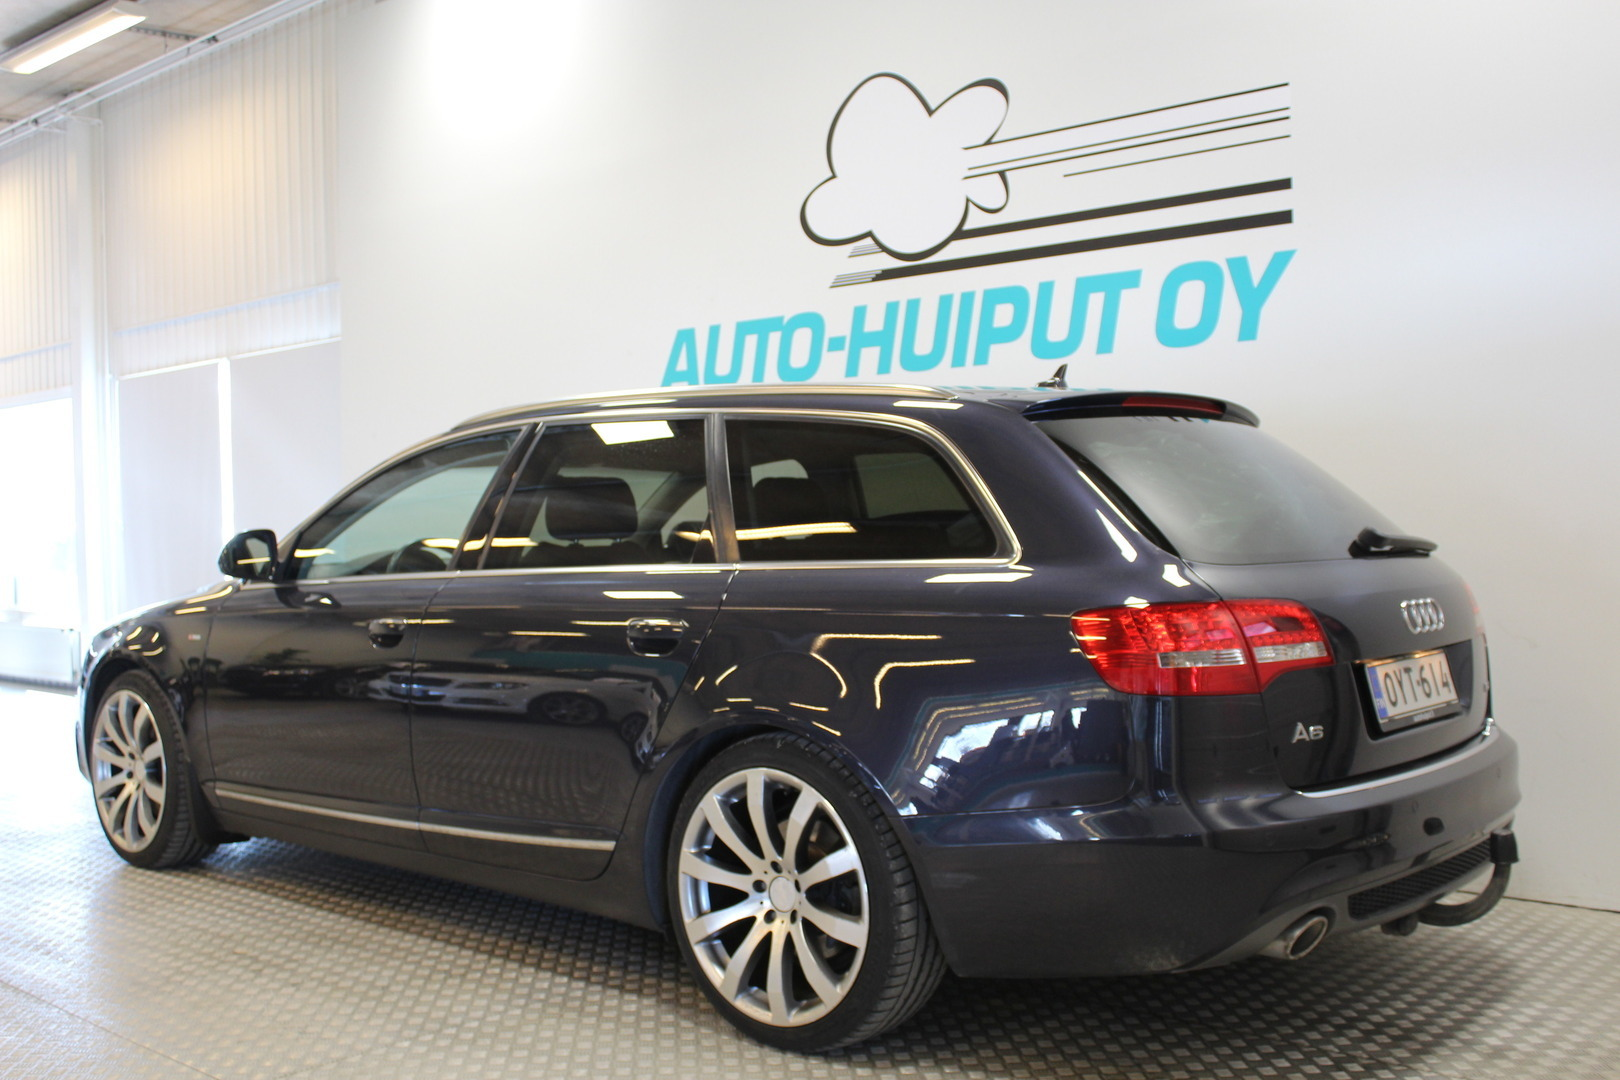 Audi A6, 2,0 TDI S line Business Plus **Juuri tullut** #Suomi-auto #Xenonit #Sporttipenkit